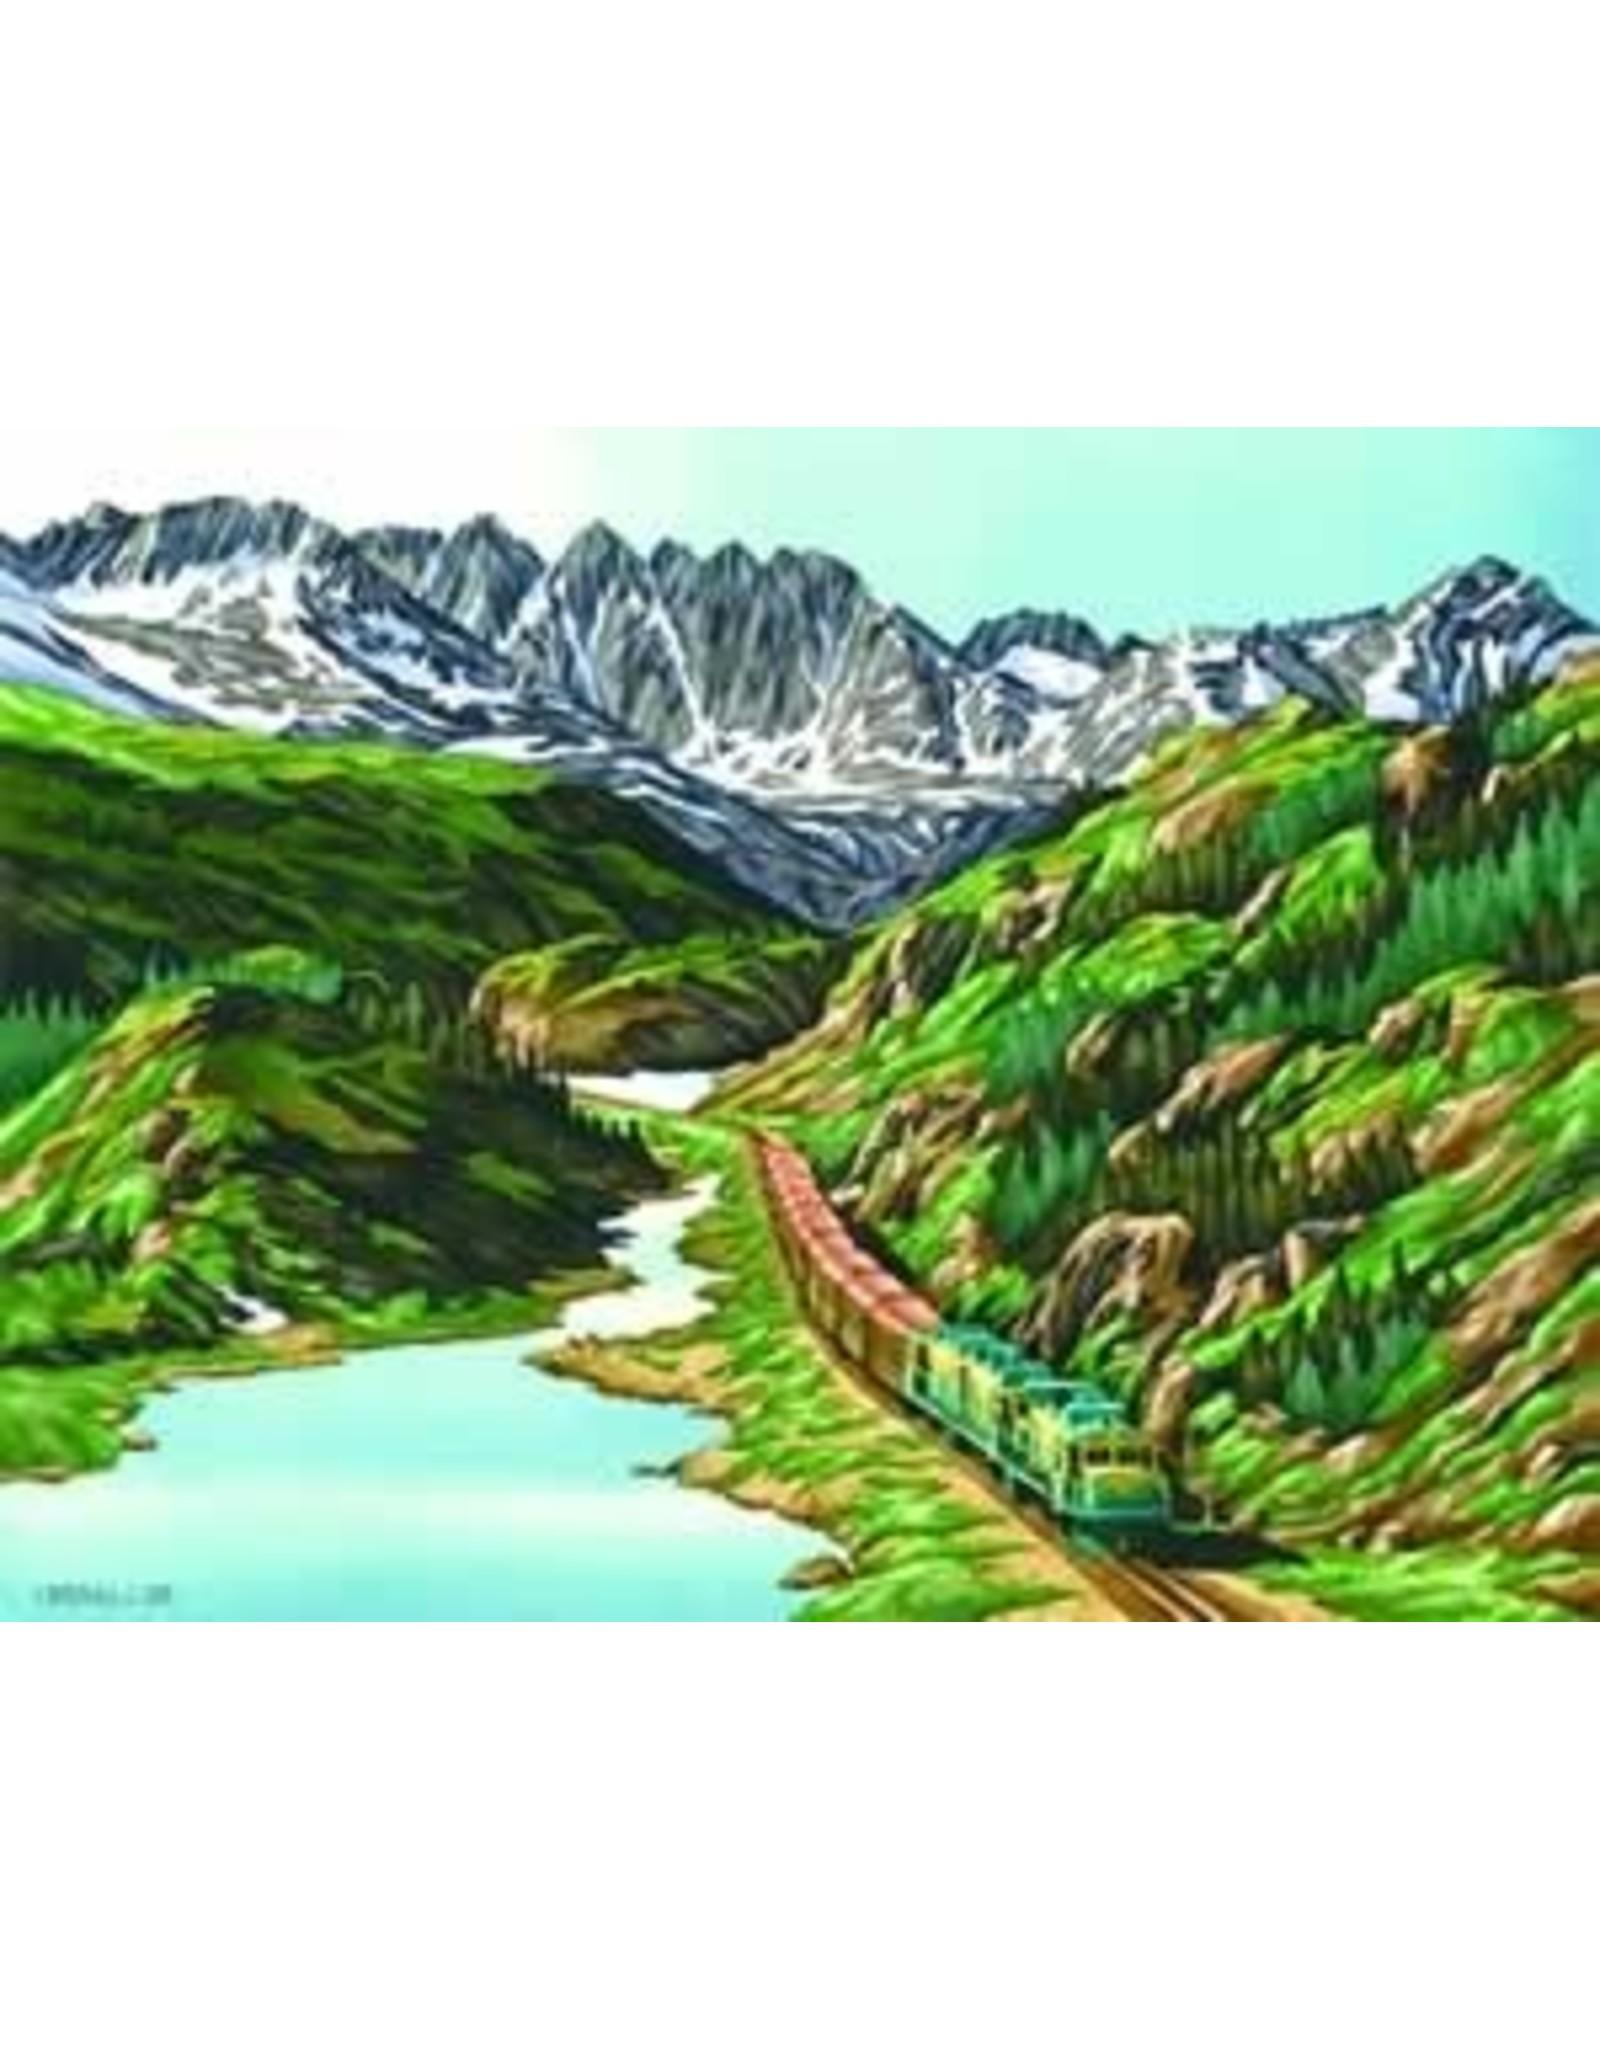 Courtenay Birdsall-Clifford On the Right Track | Courtenay Birdsall-Clifford